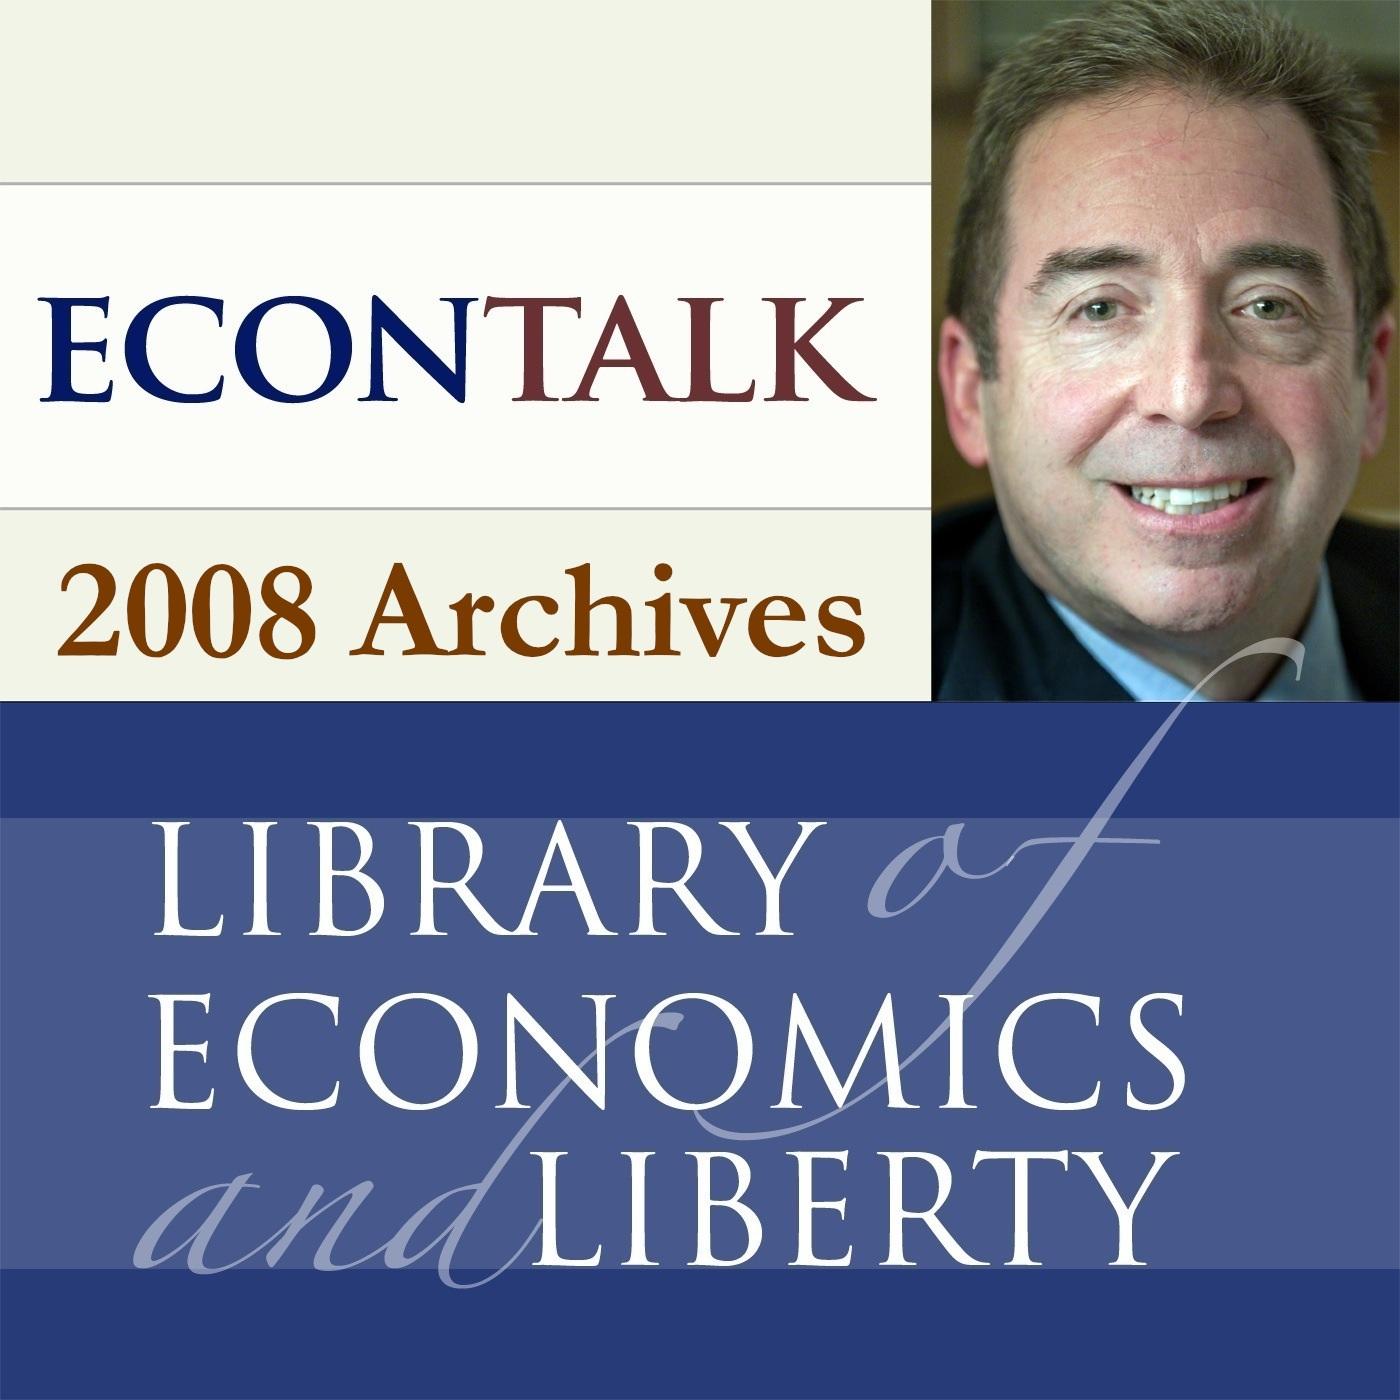 EconTalk Archives, 2008